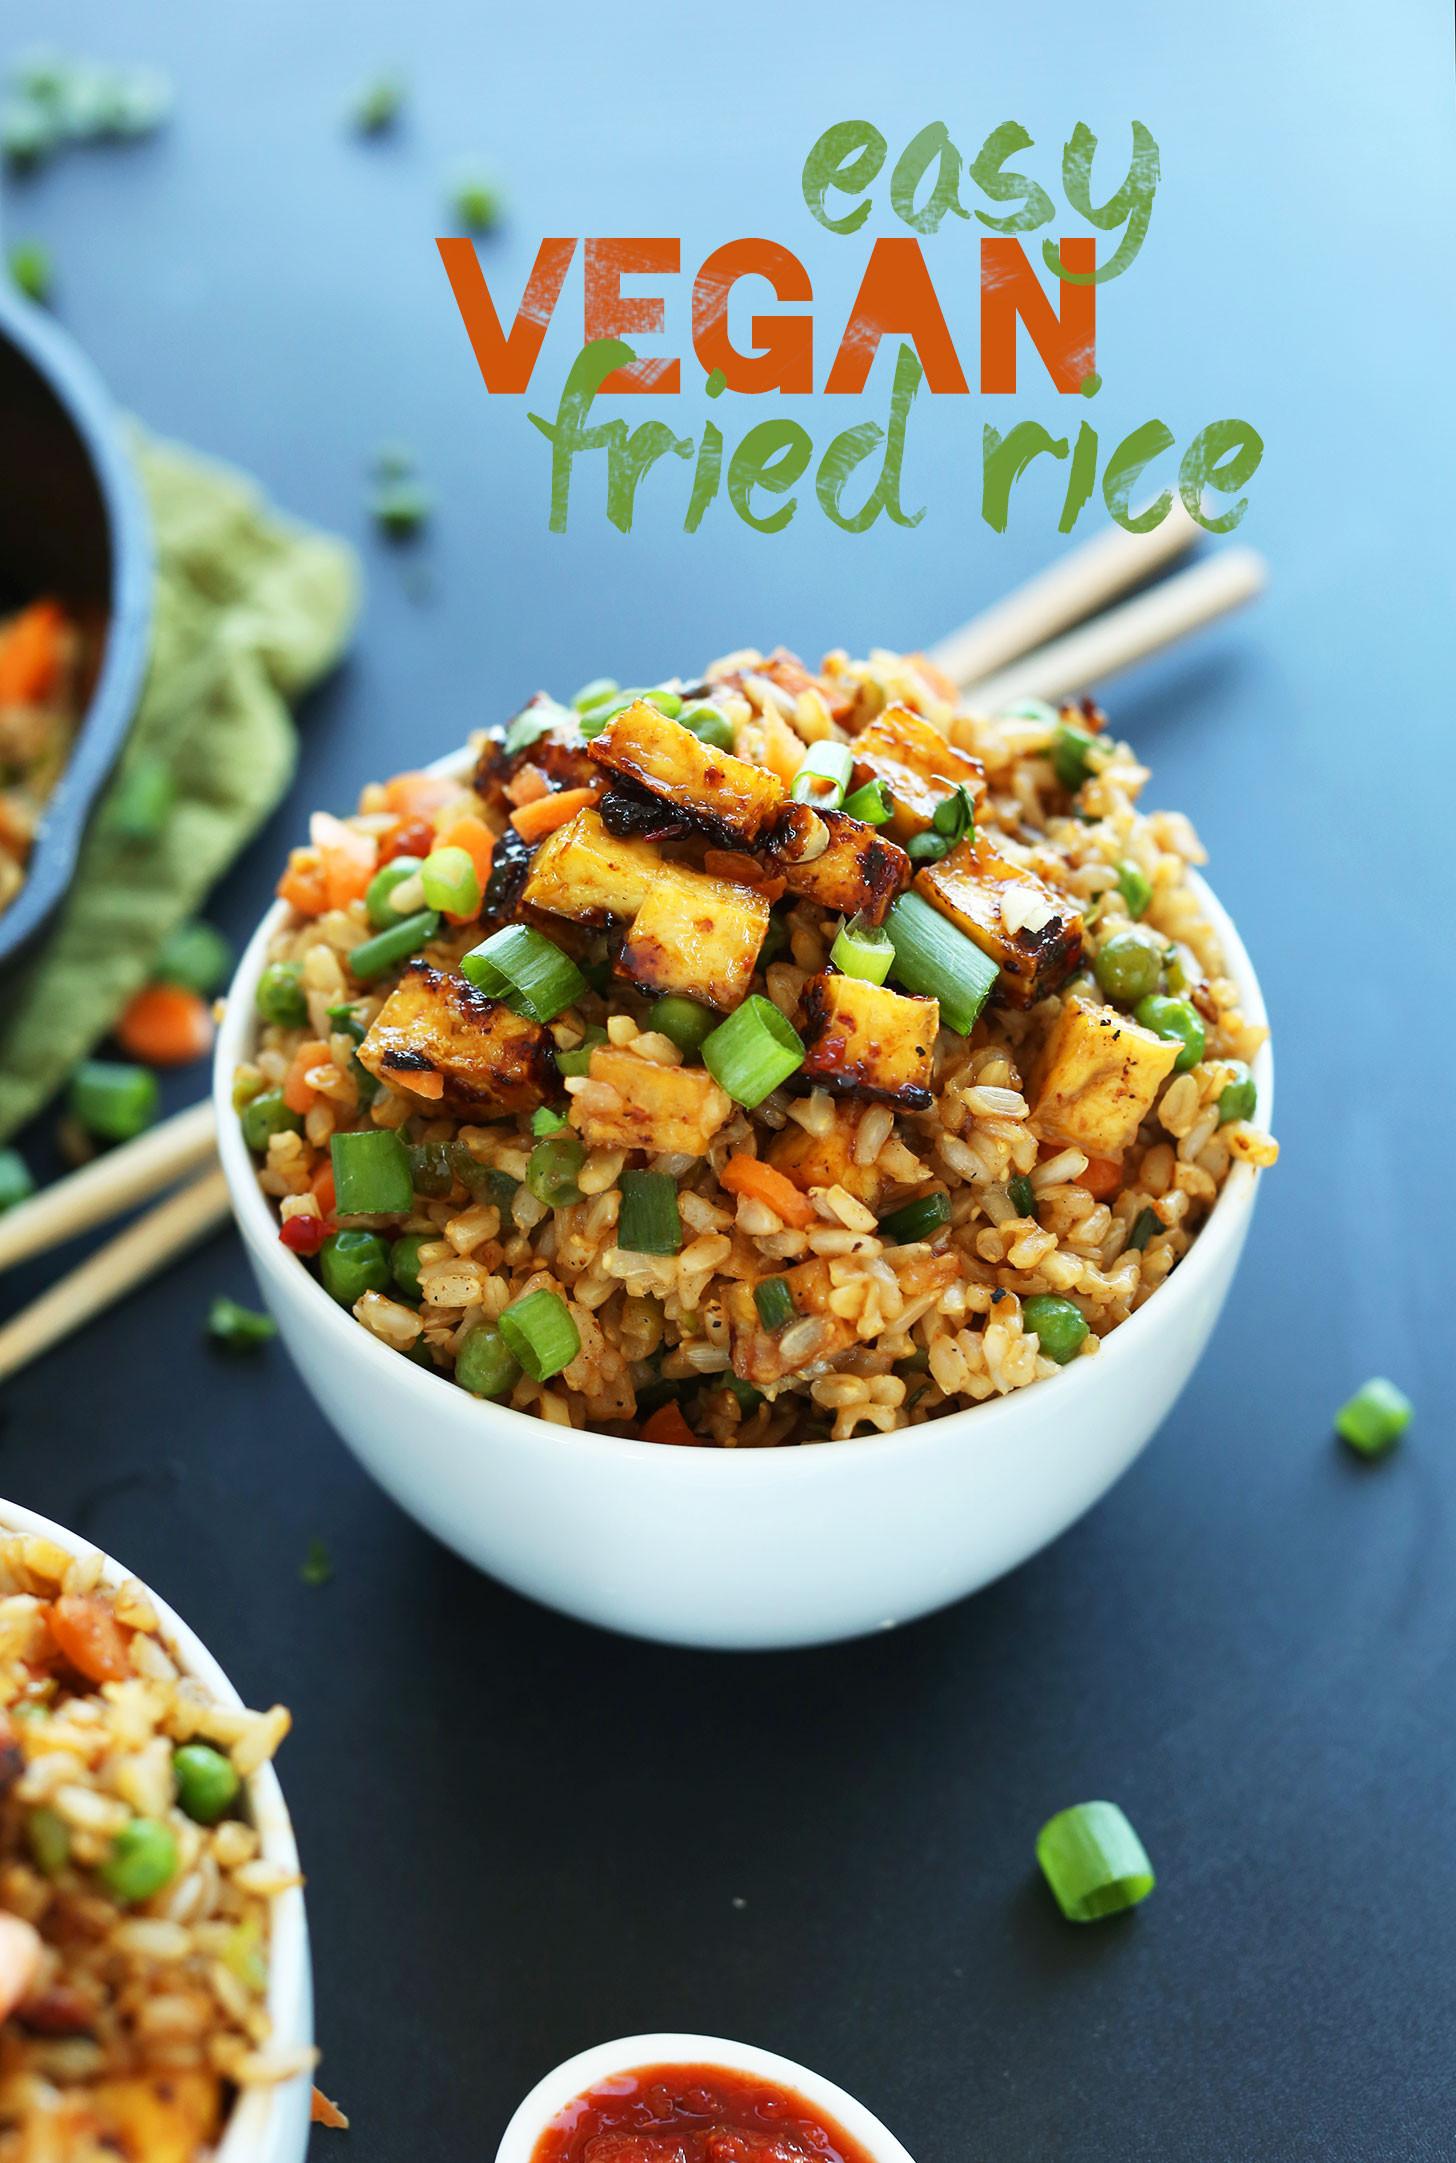 Vegan Recipes Healthy  Vegan Fried Rice